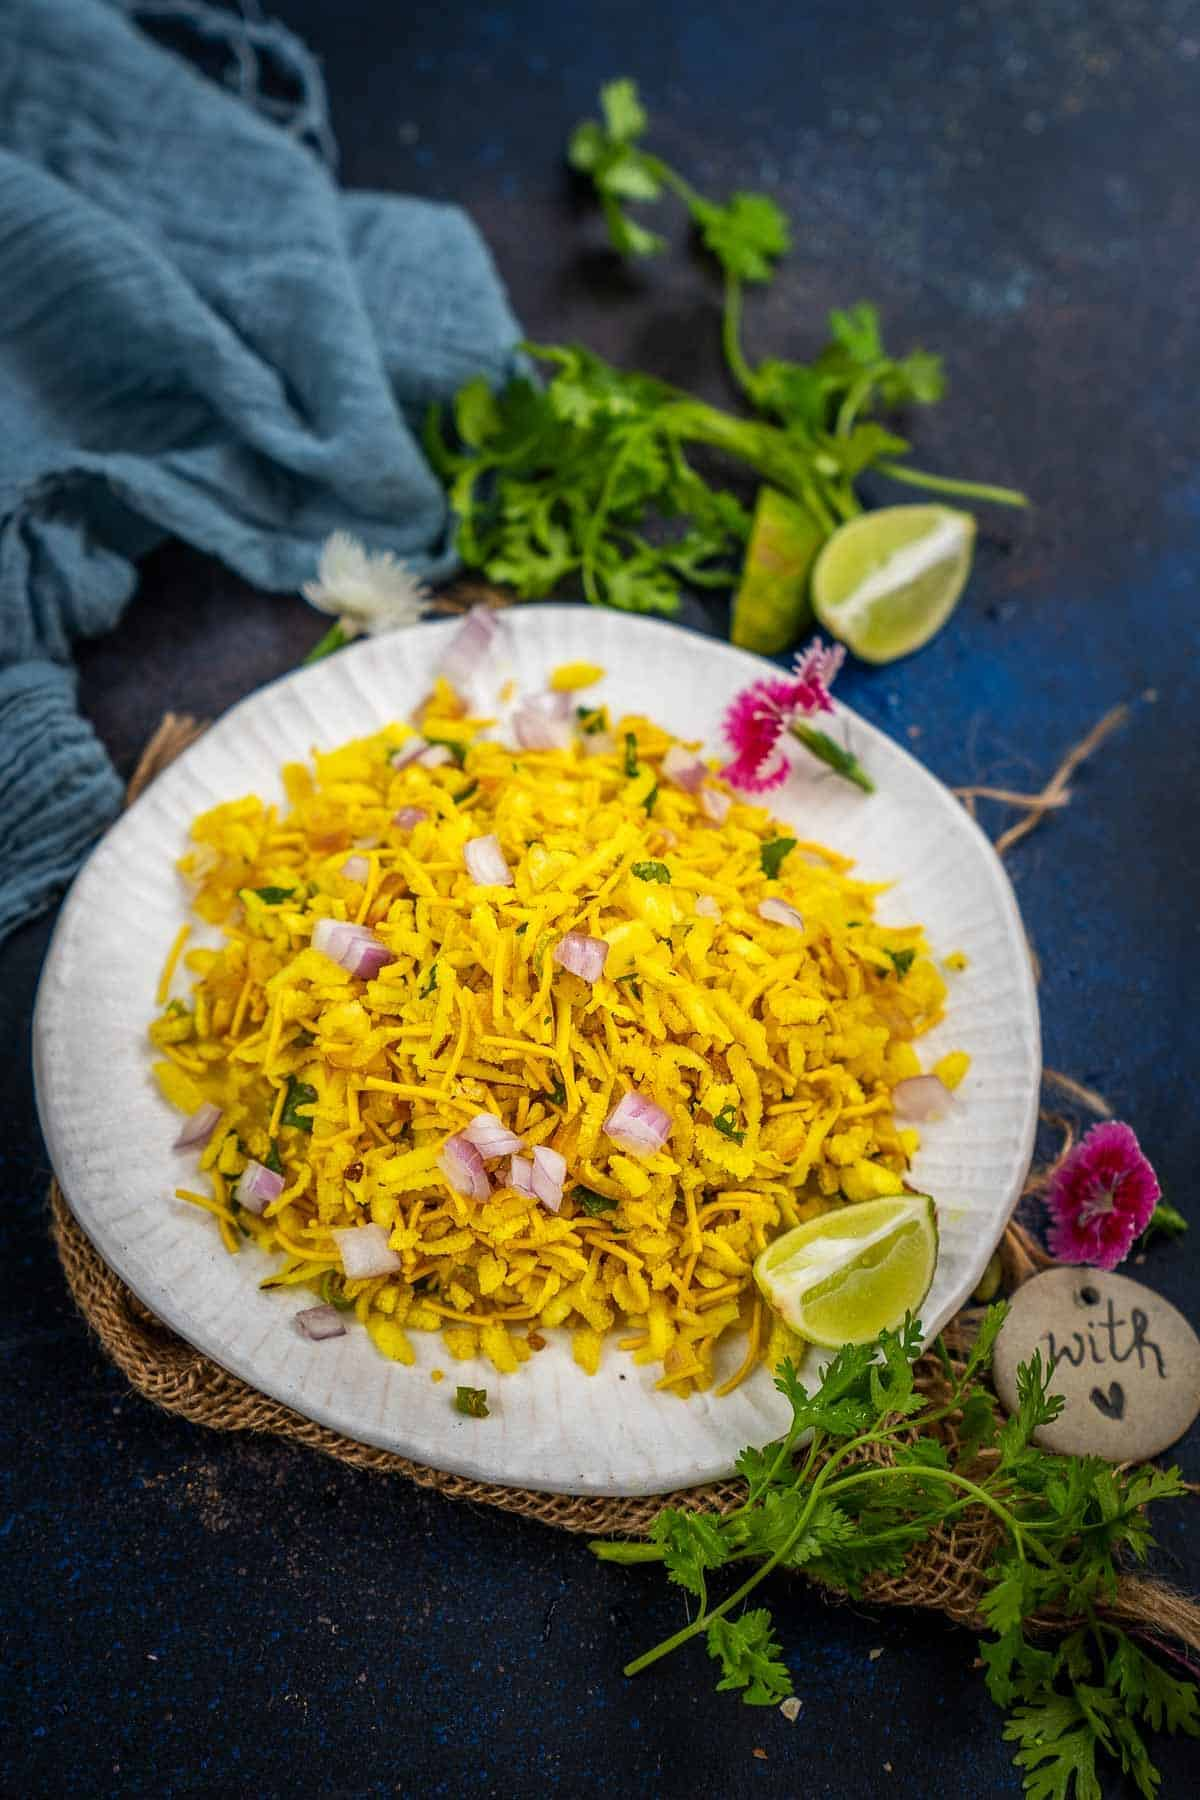 Poha bhel served on a plate.